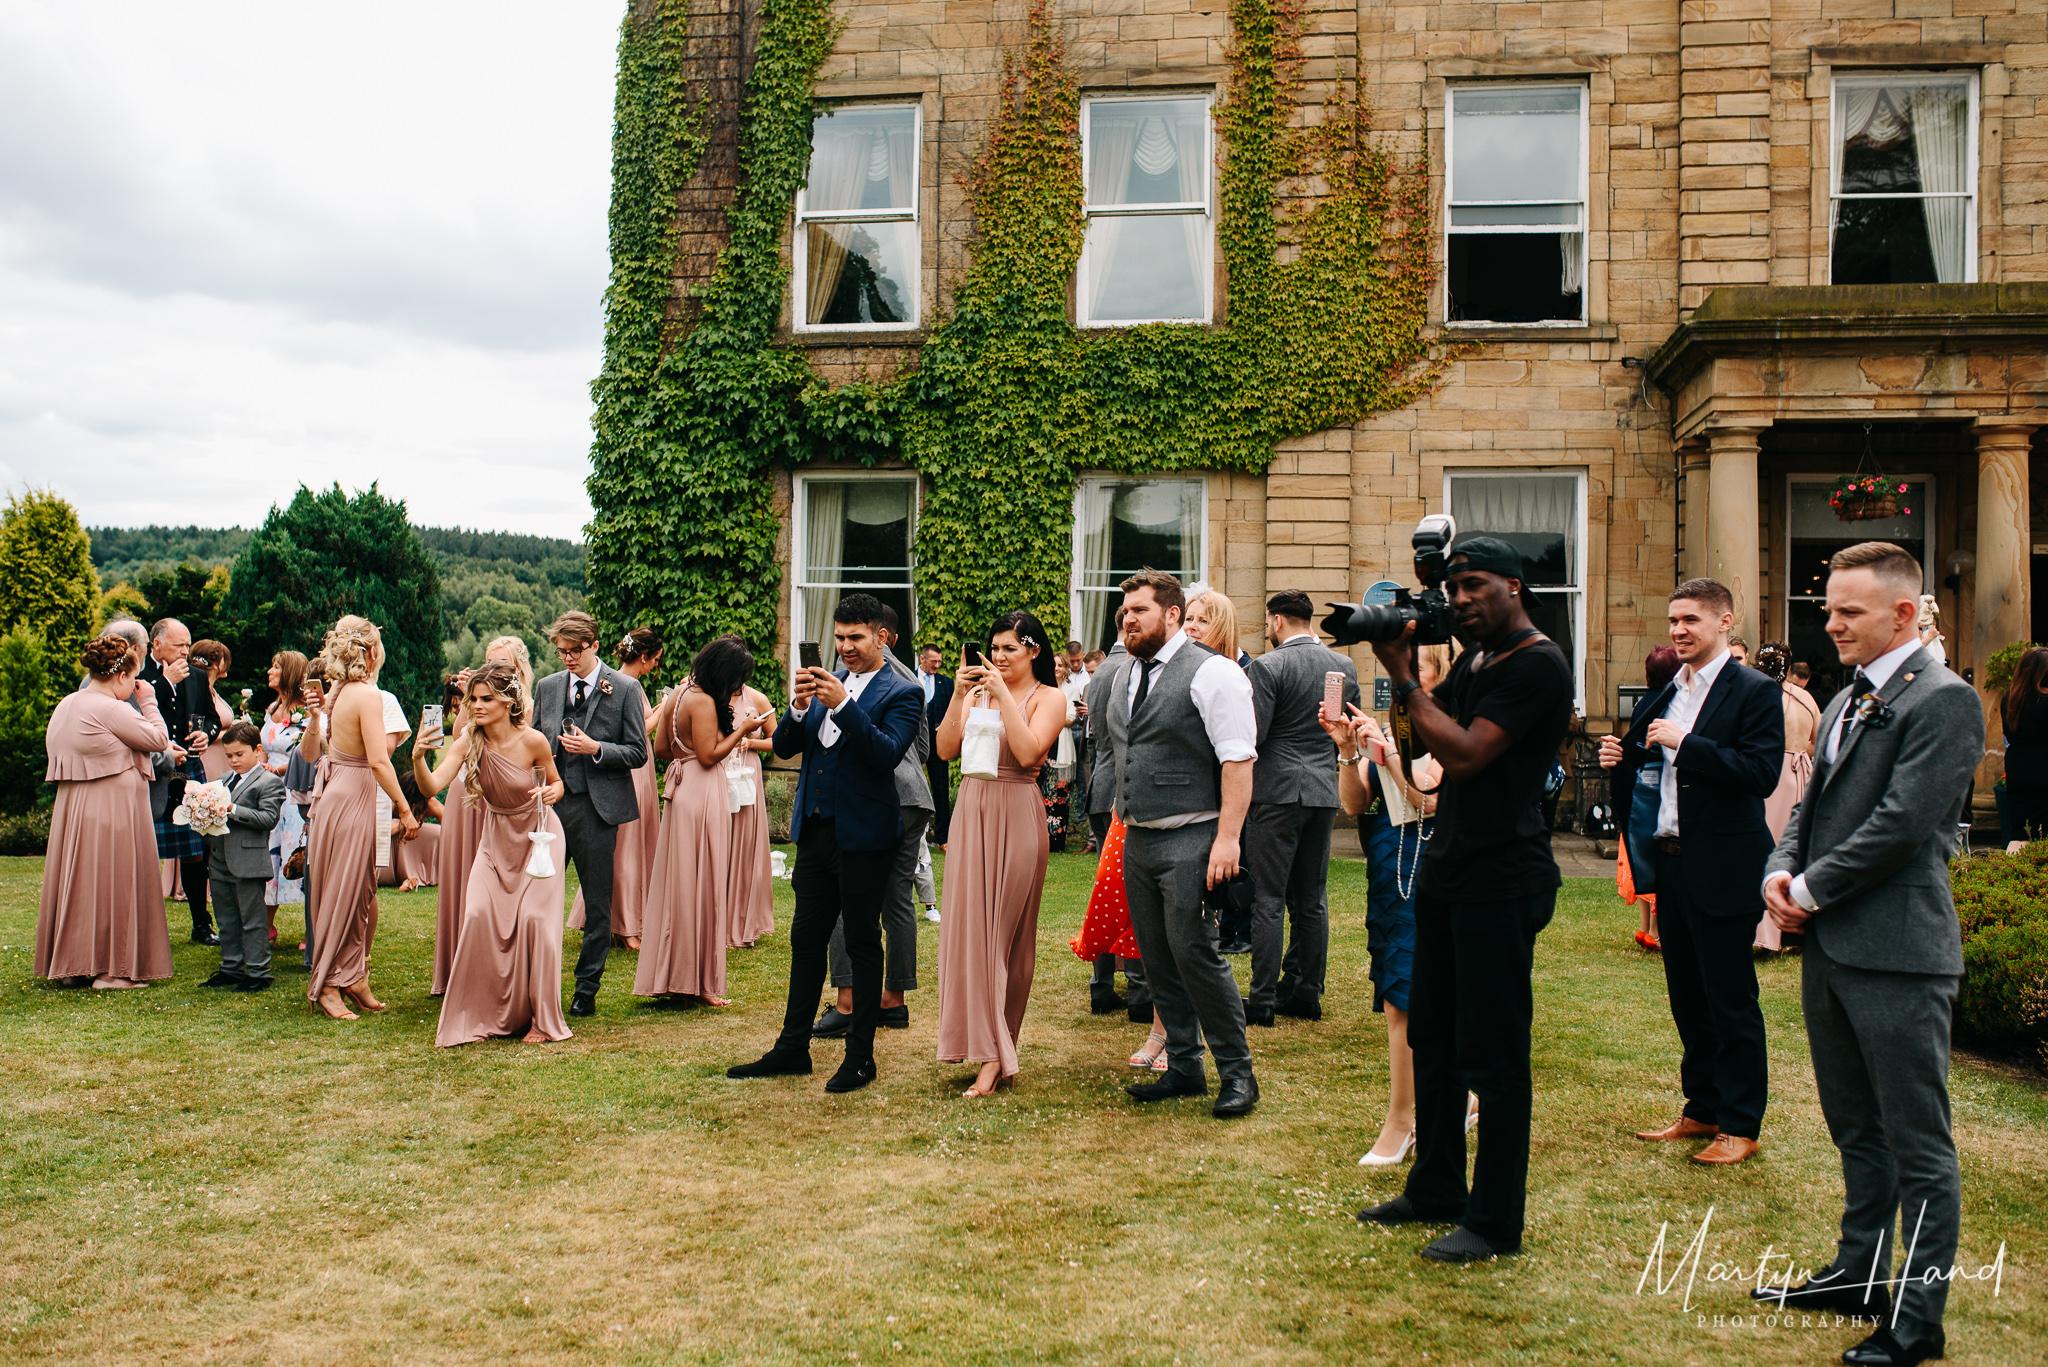 Waterton Park Hotel Wedding Photographer Martyn Hand Photography